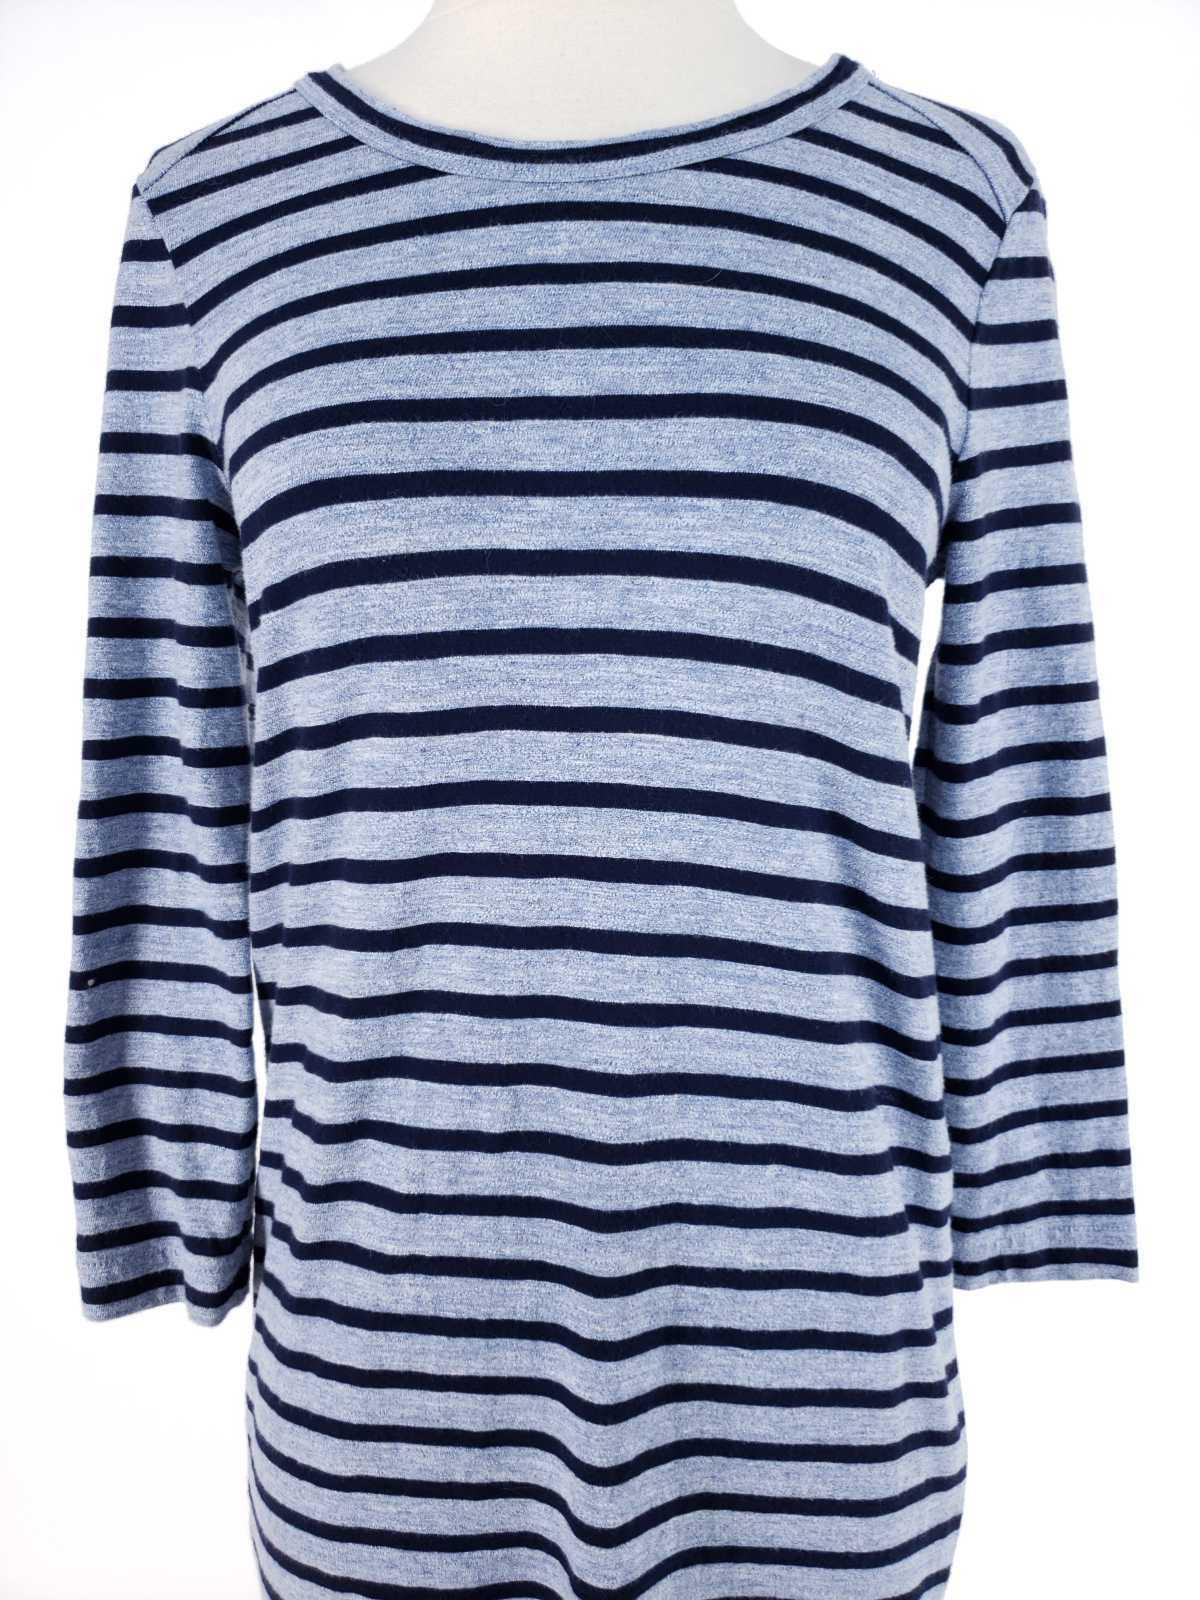 J.Crew Women XS Dress Striped Side Zip Tshirt Cotton Long Sleeve Casual image 2